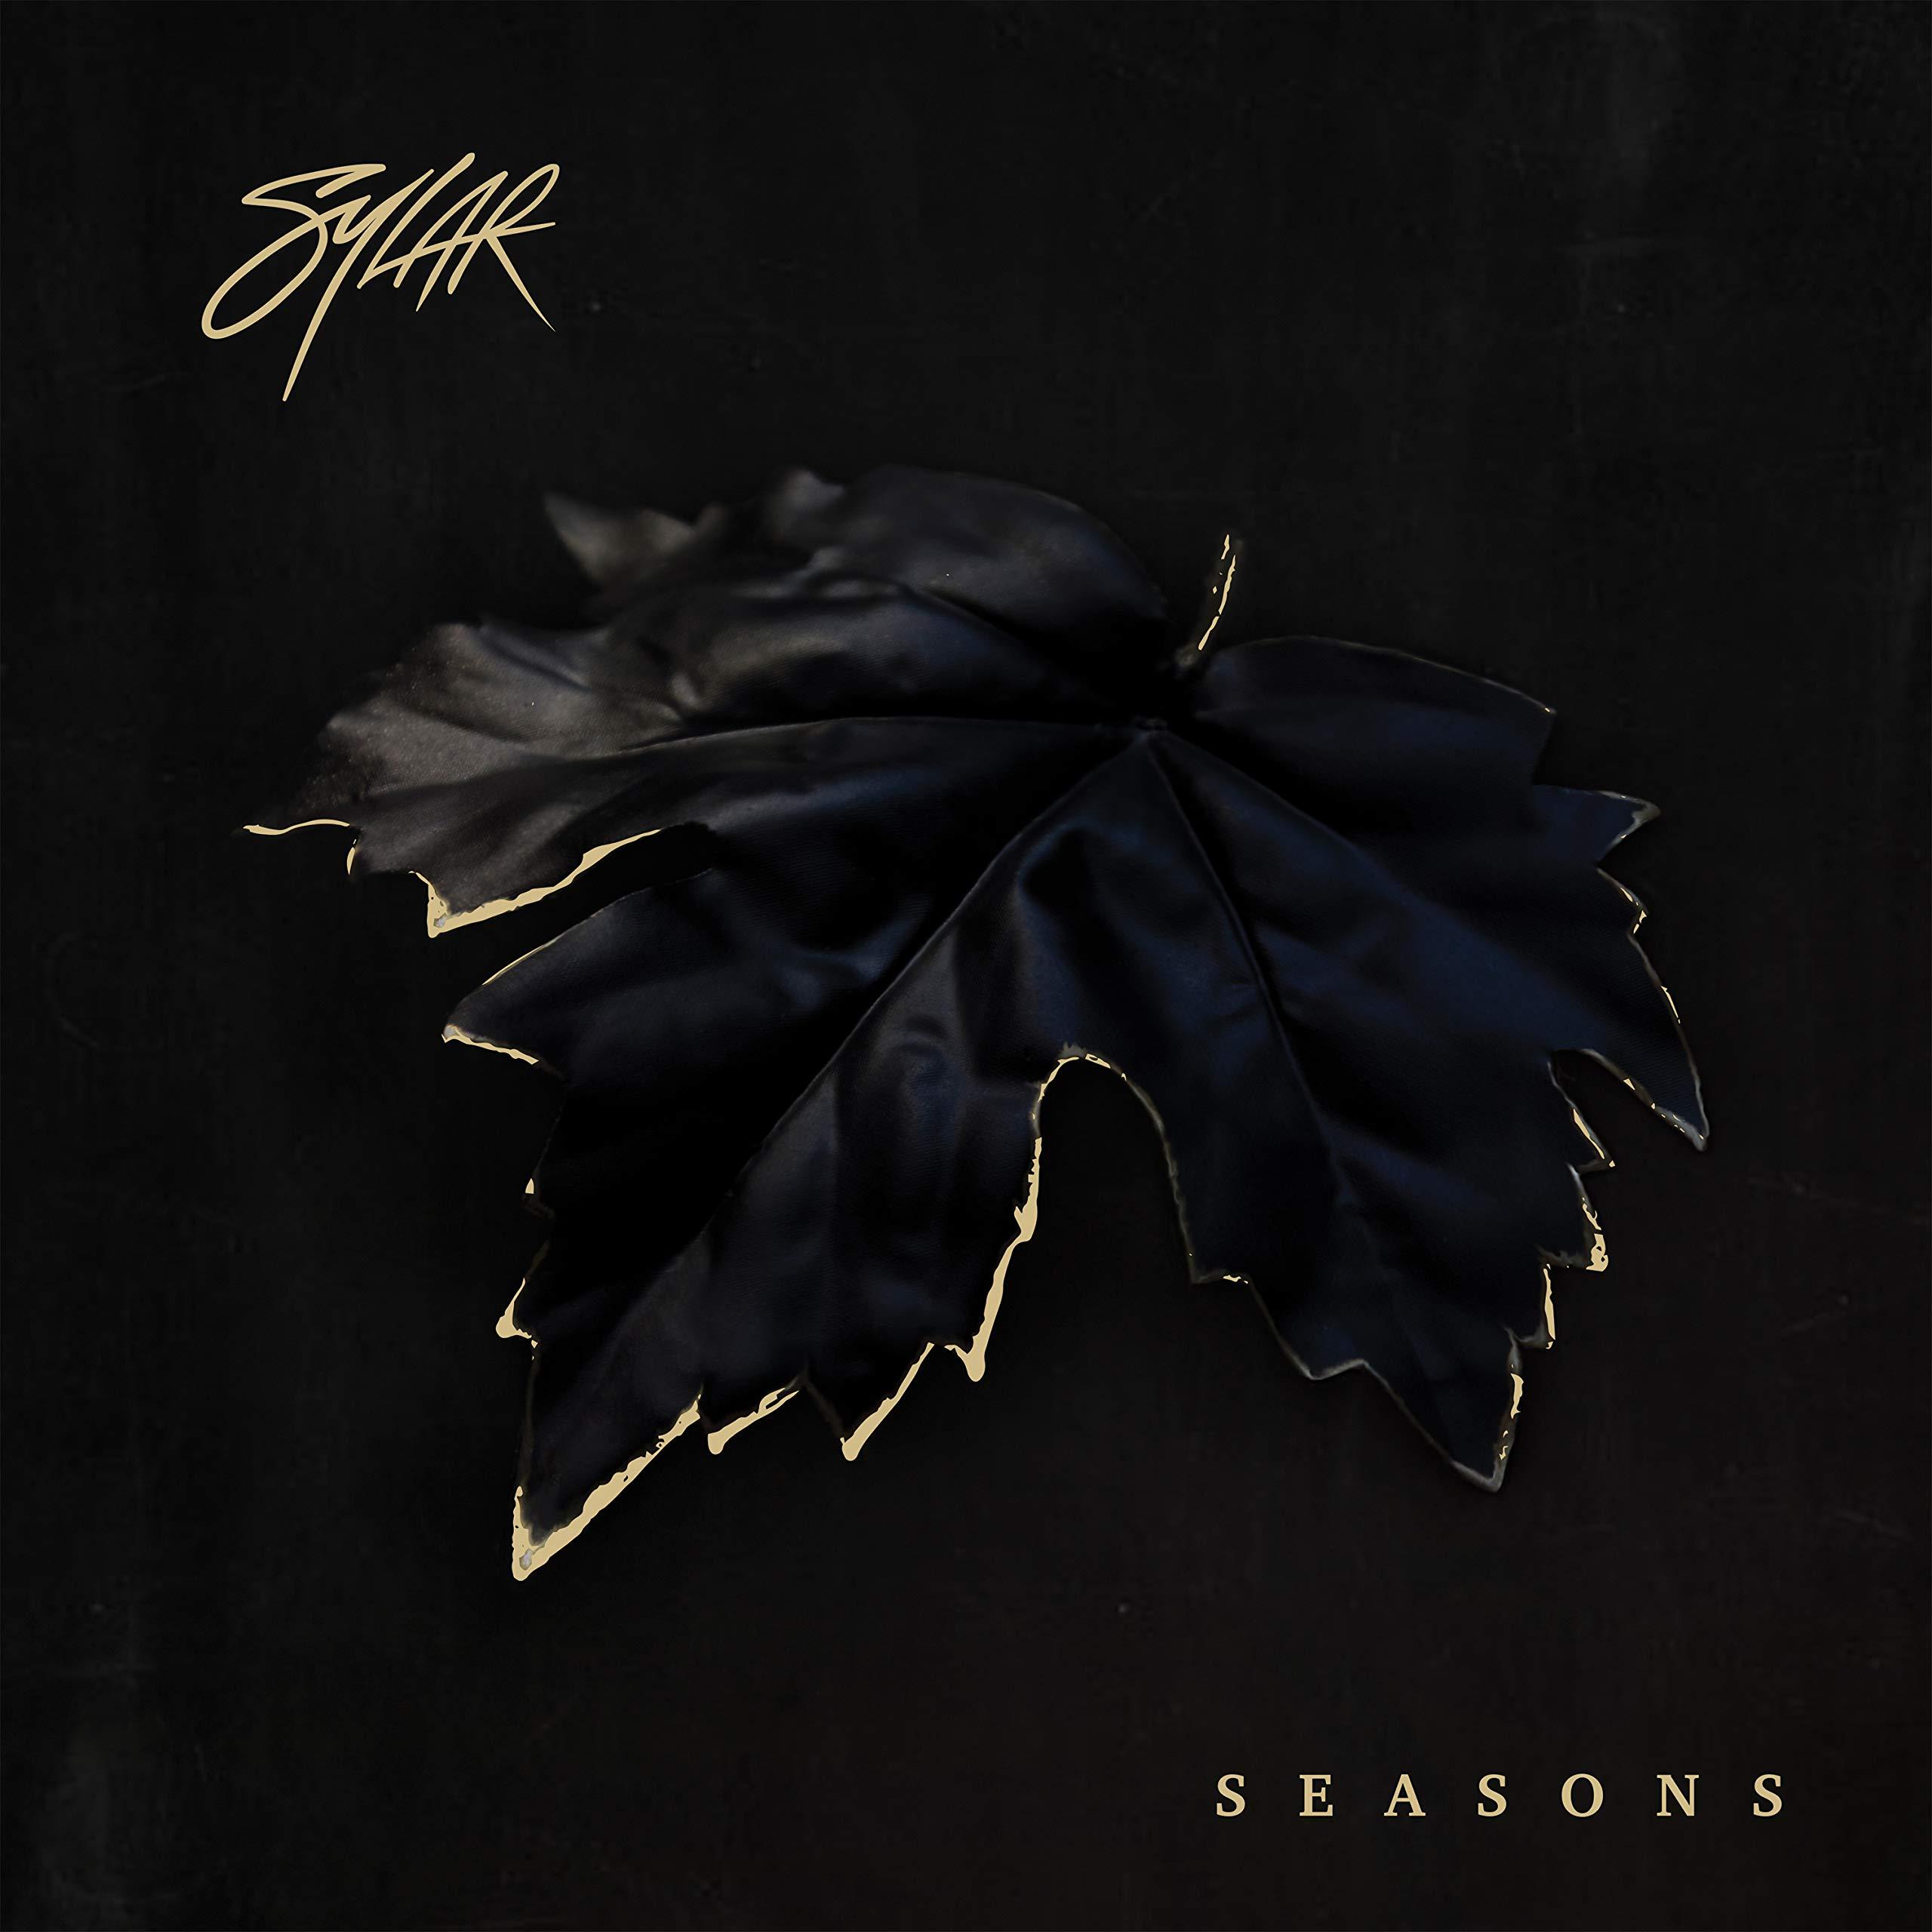 Vinilo : Sylar - Seasons (Digital Download Card)